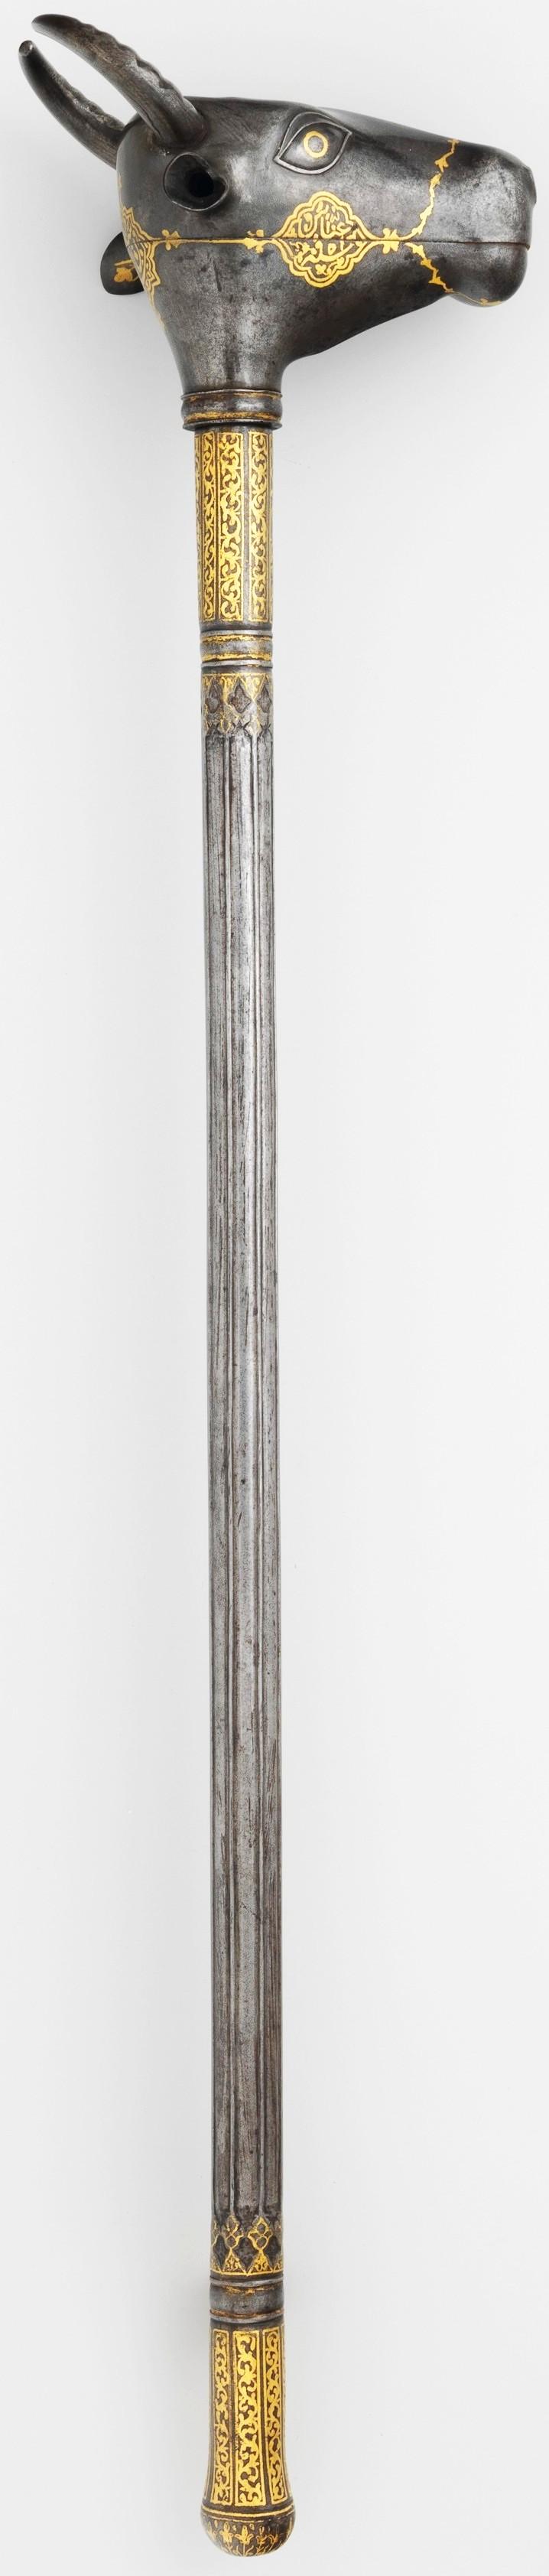 Persian mace, 17th century, steel, gold, L. 321/2 in. (82.6 cm), Met Museum, Bequest of George C. Stone, 1935.